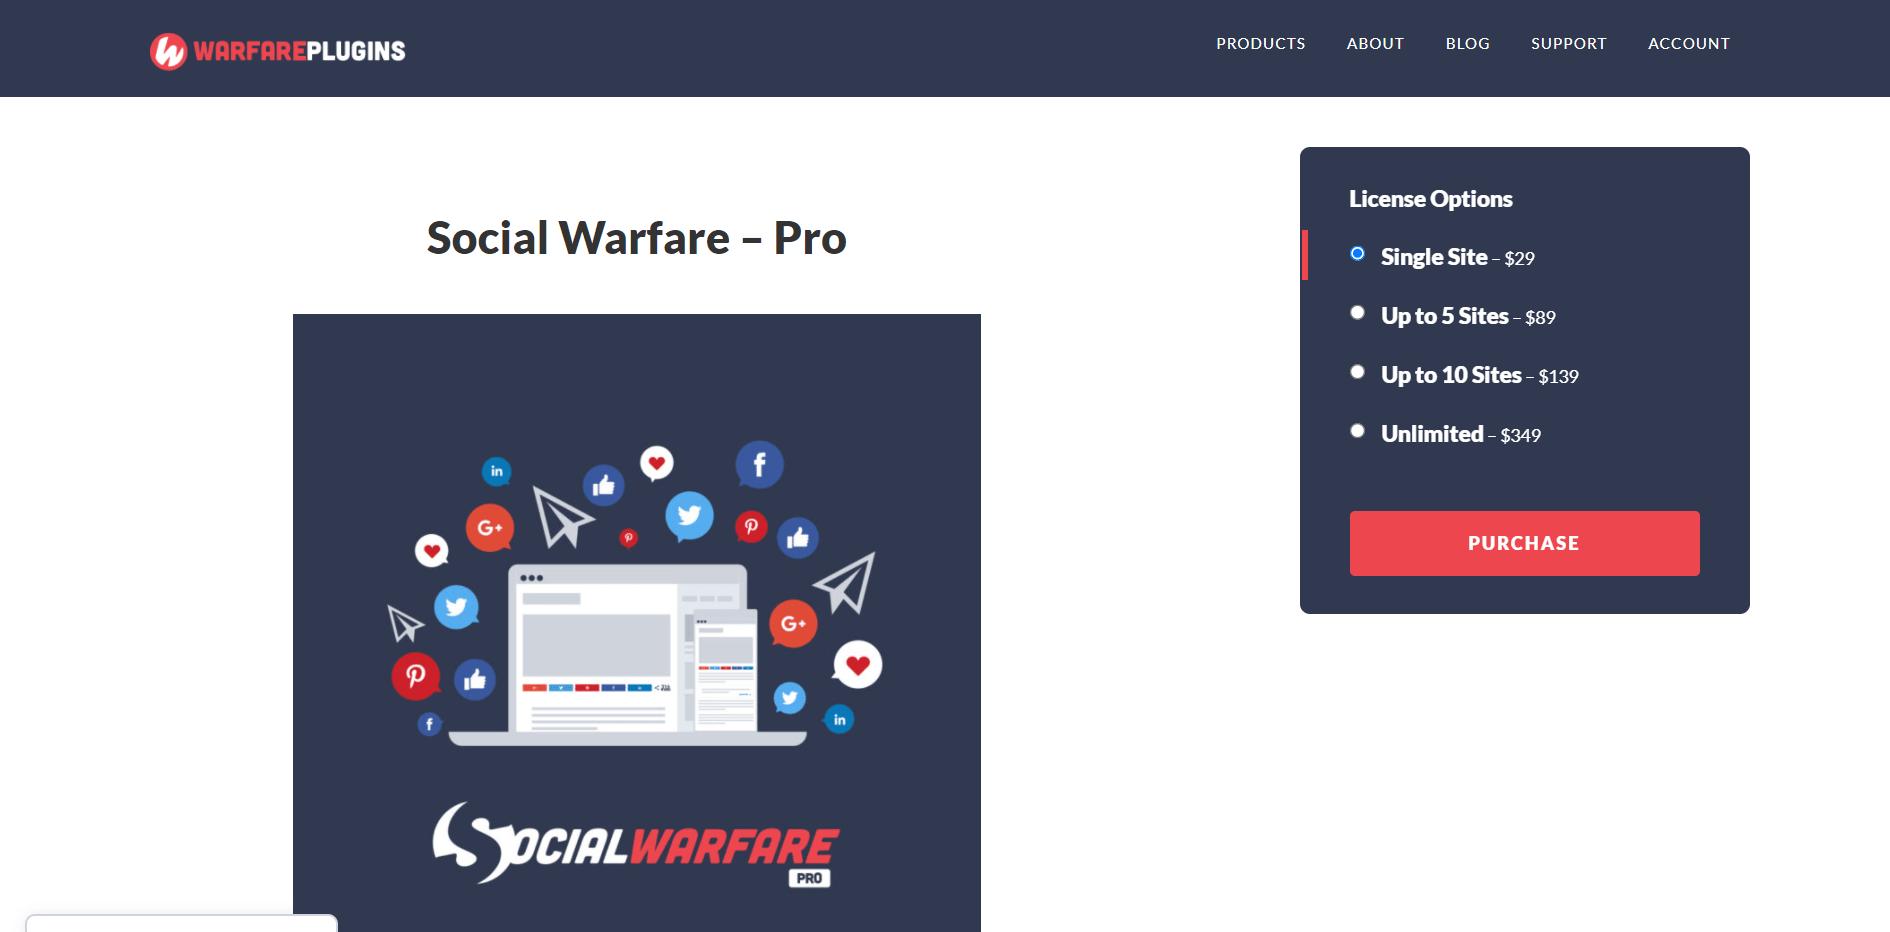 Social Warfare Plugins pricing